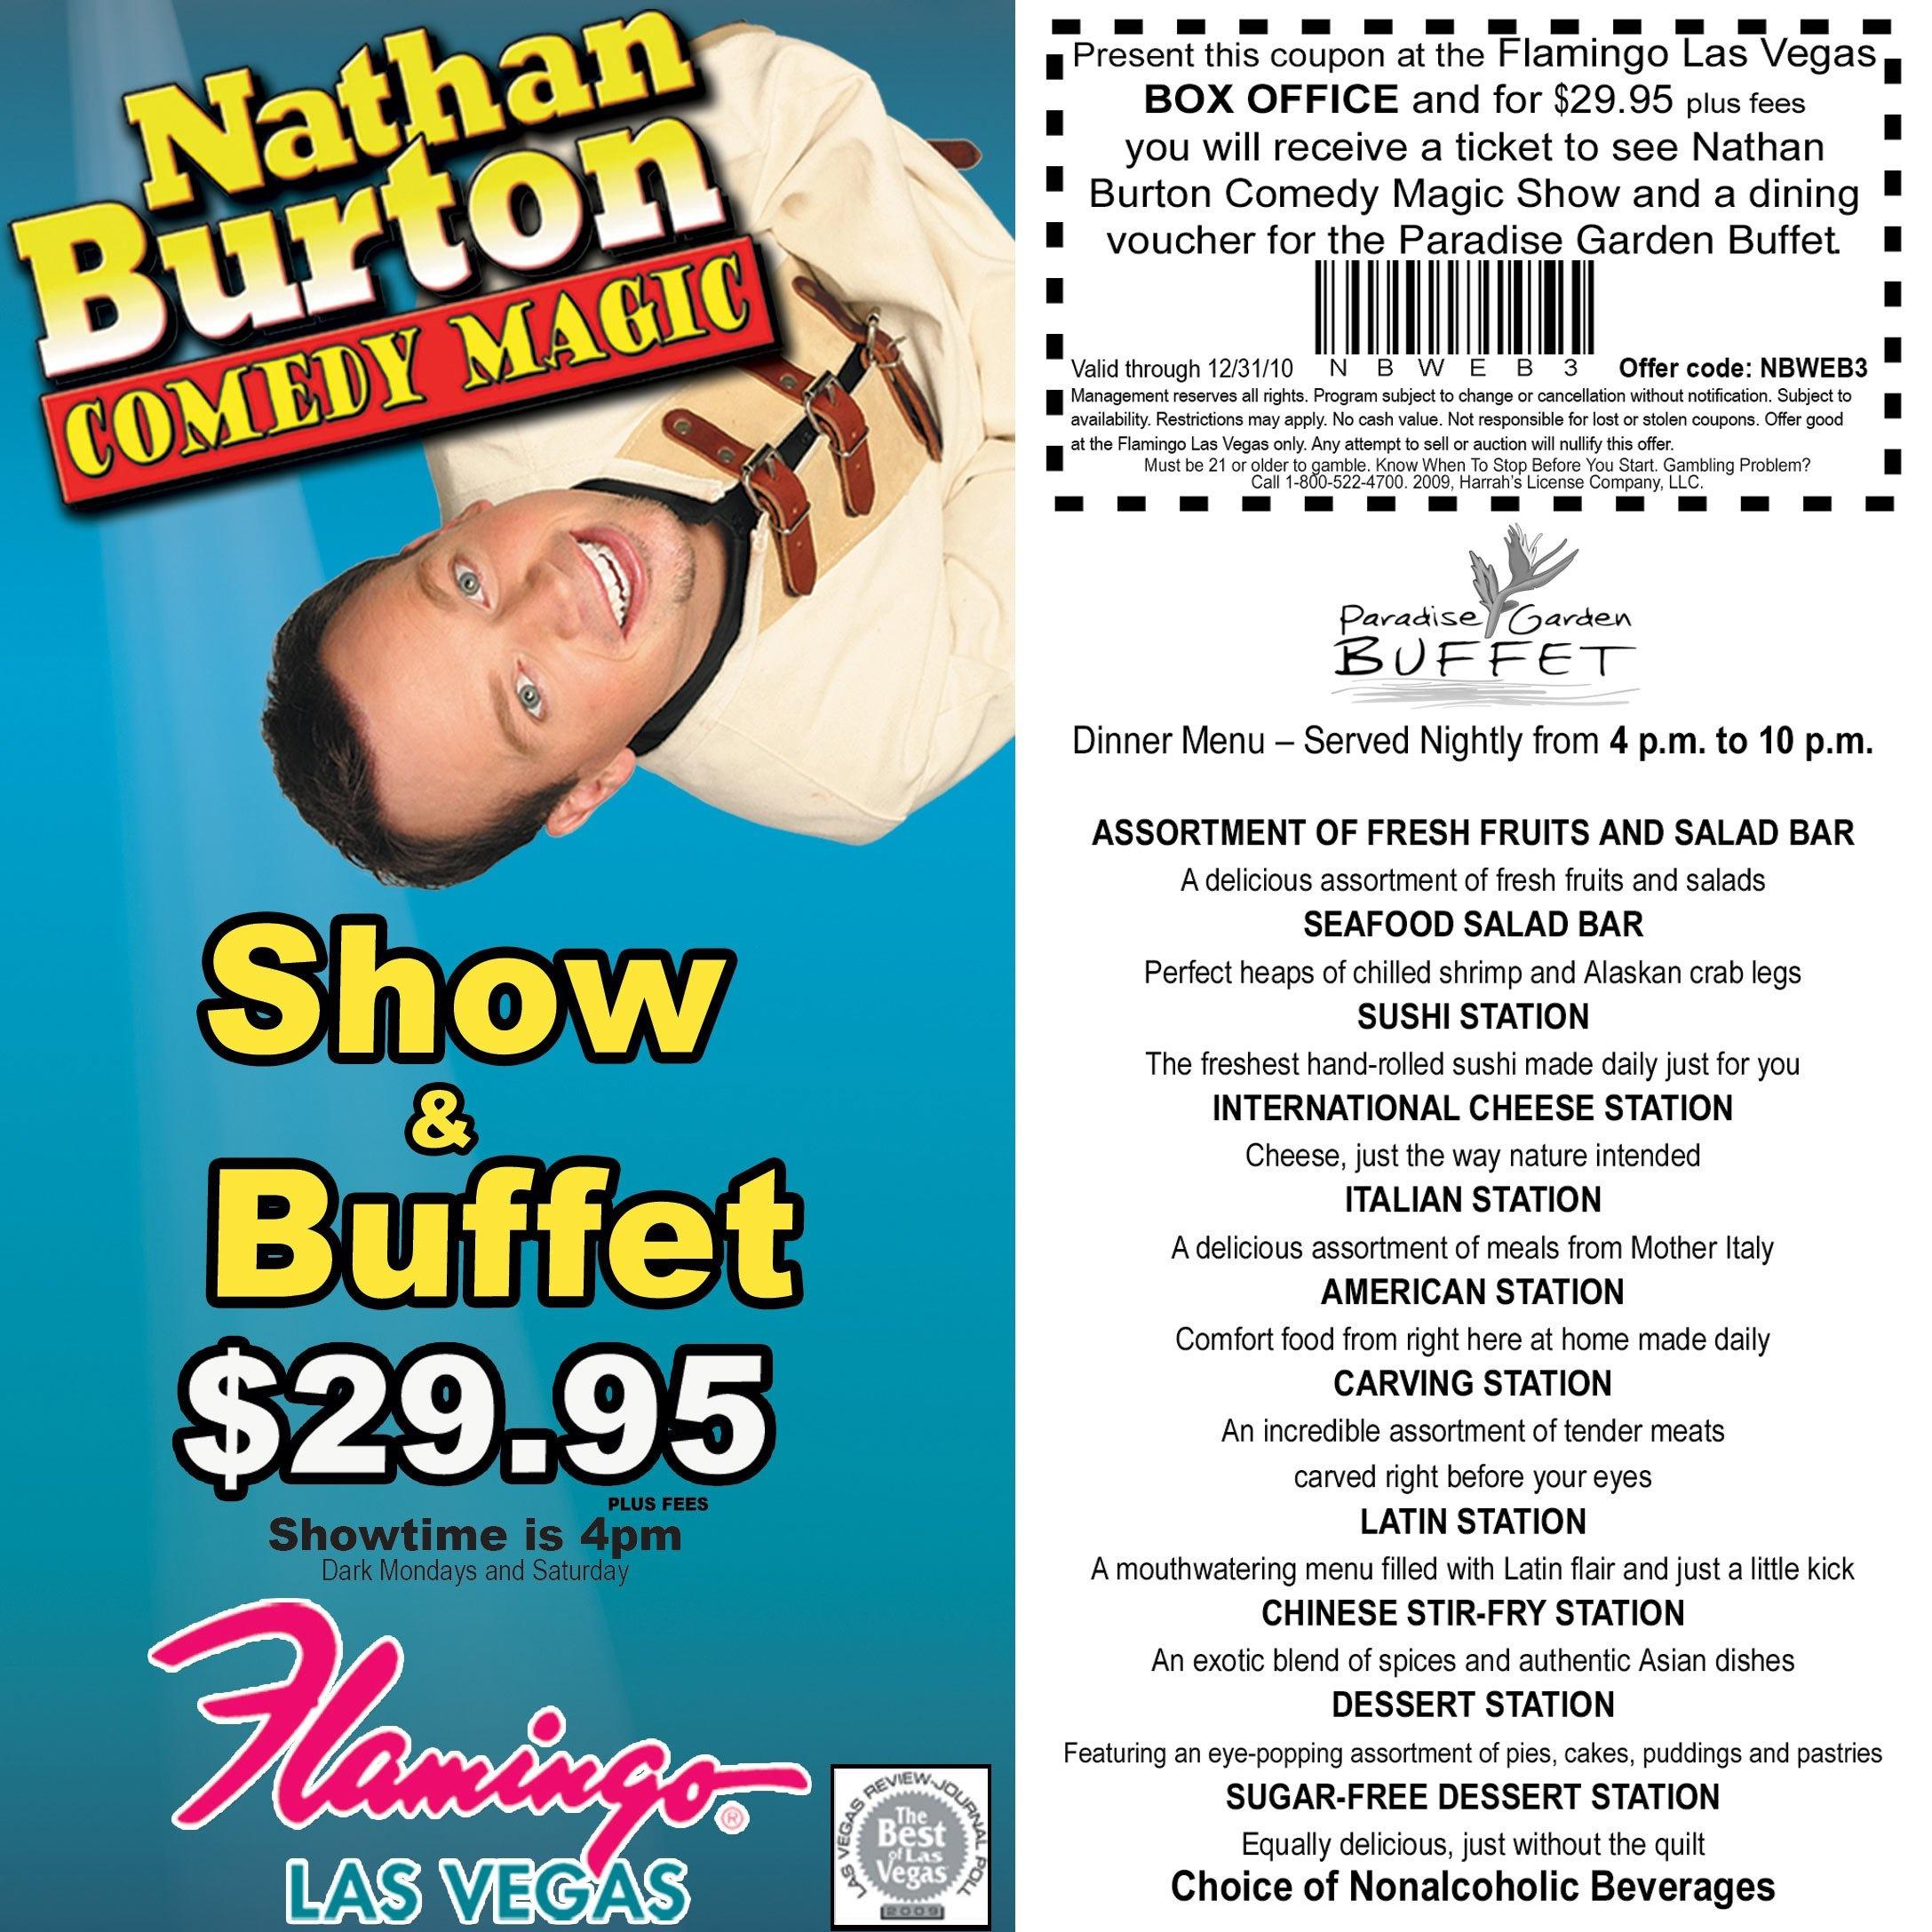 Jubilee Show Tickets 2 For 1 Las Vegas Coupon At Ballys Sweet - Free Printable Las Vegas Coupons 2014